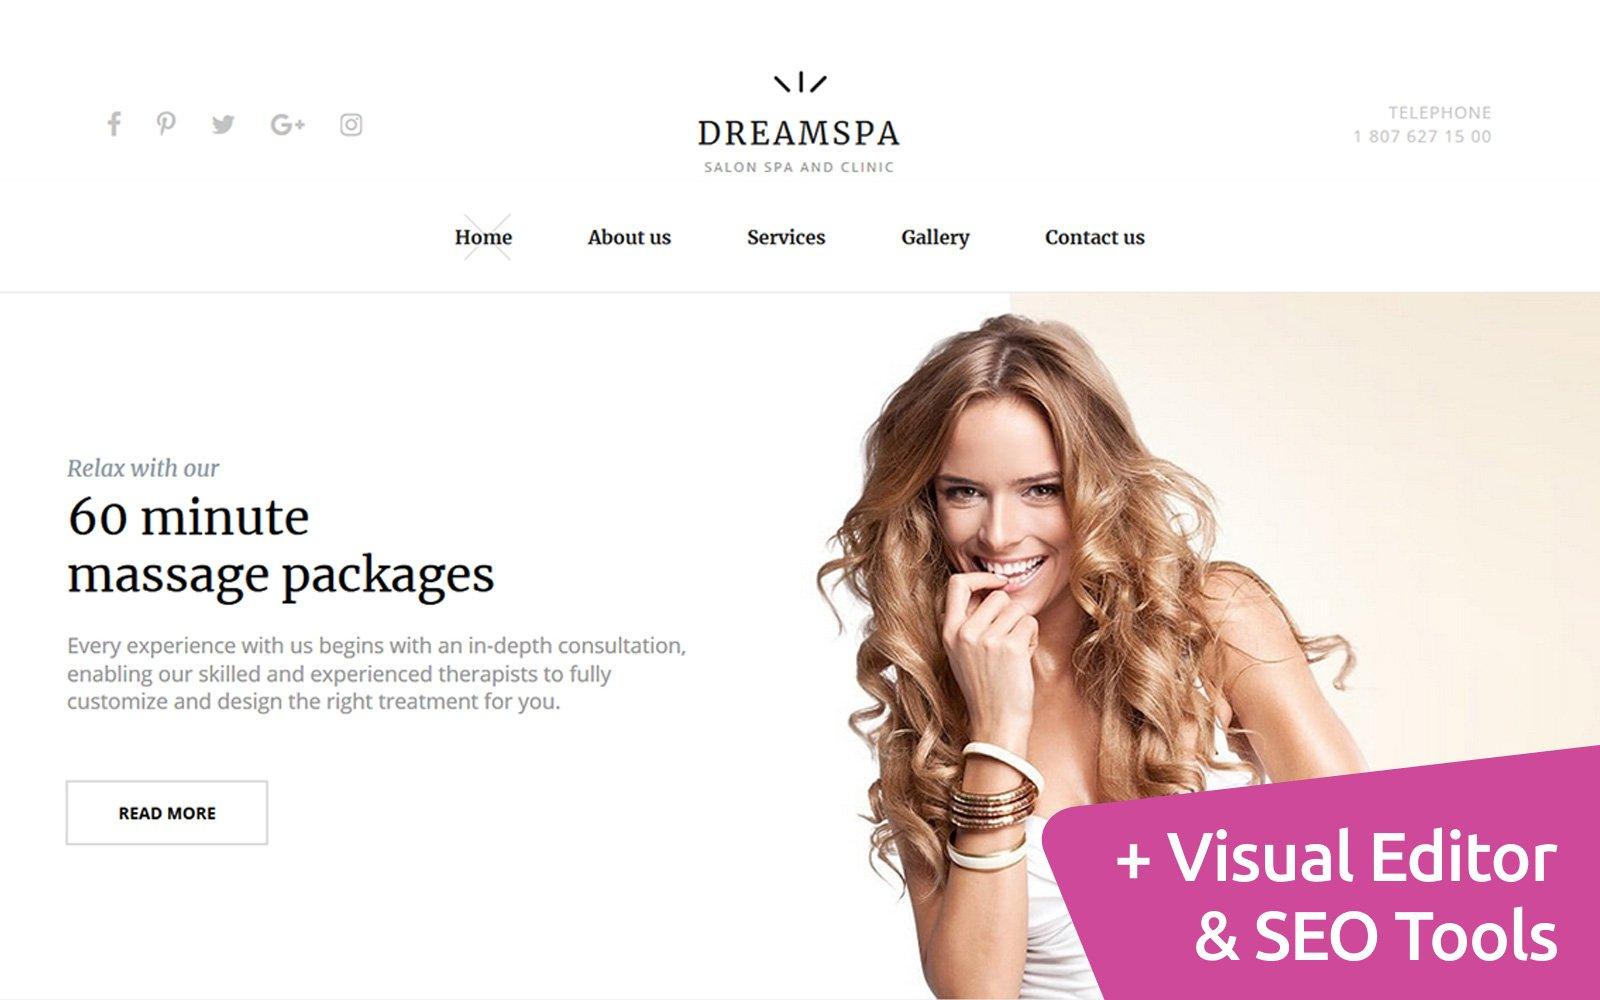 DreamSpa - Spa Health & Skincare Moto CMS 3 Template